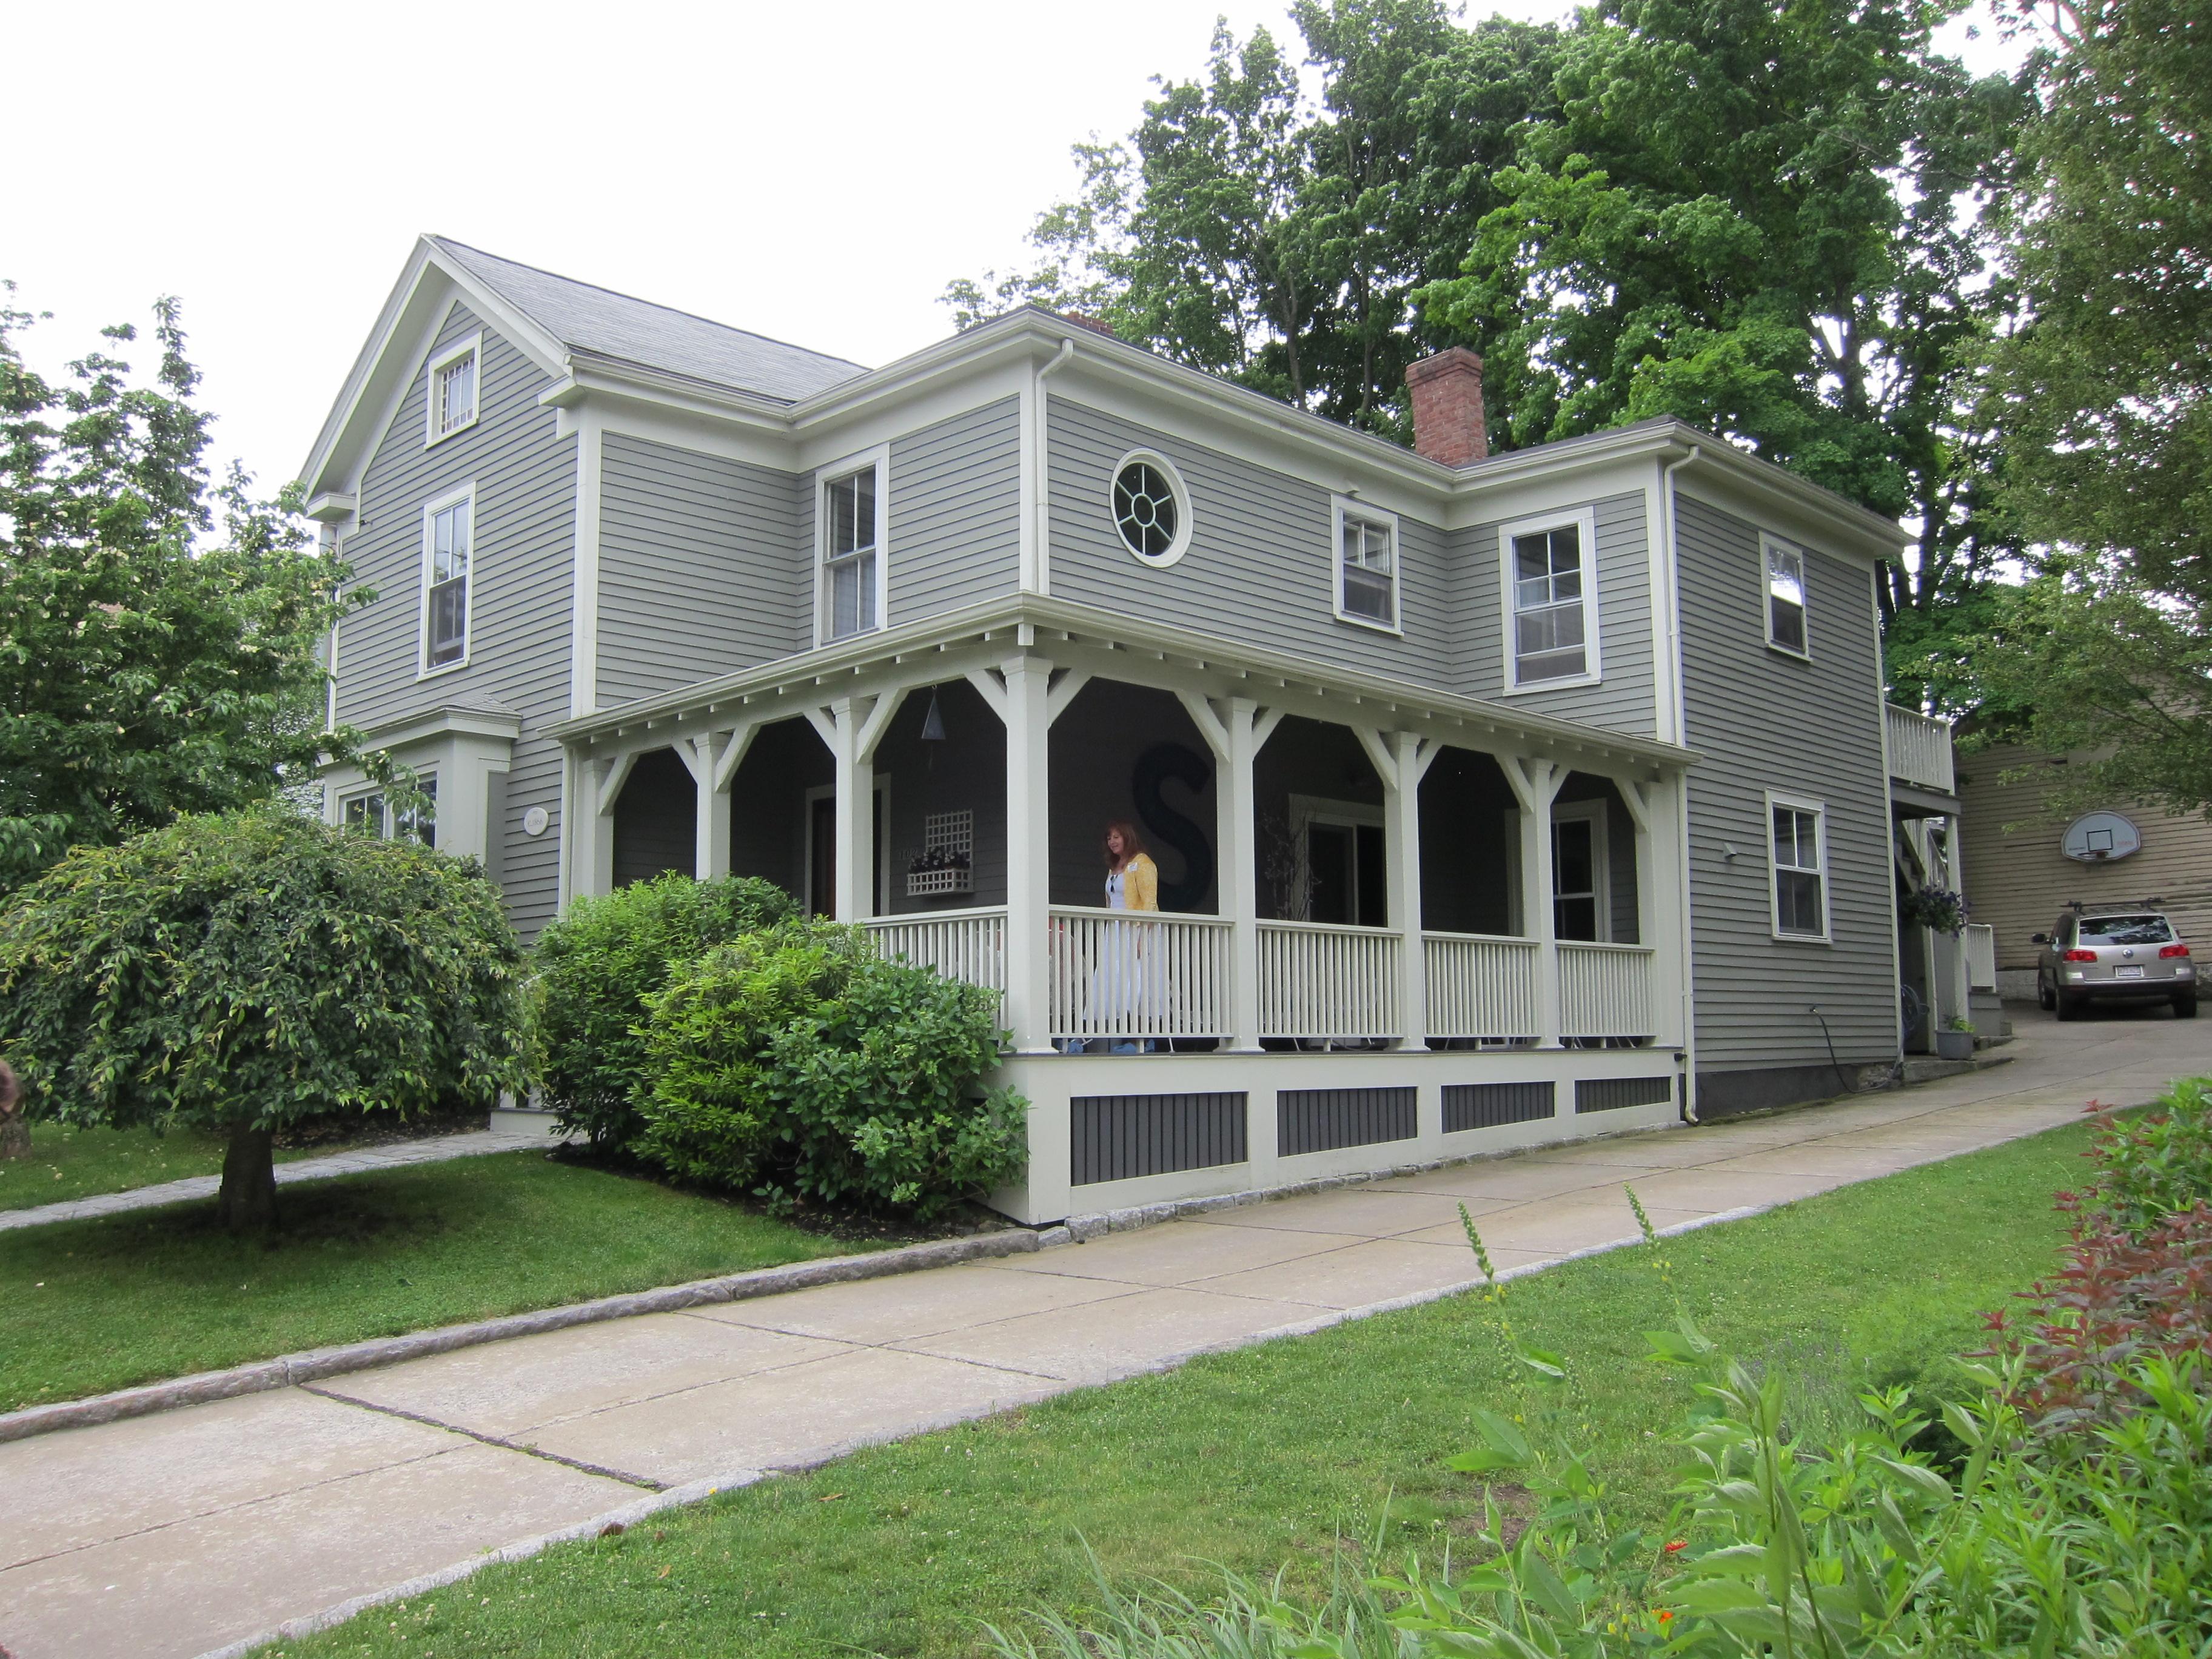 Newton House Tour 2012 - Featured Home